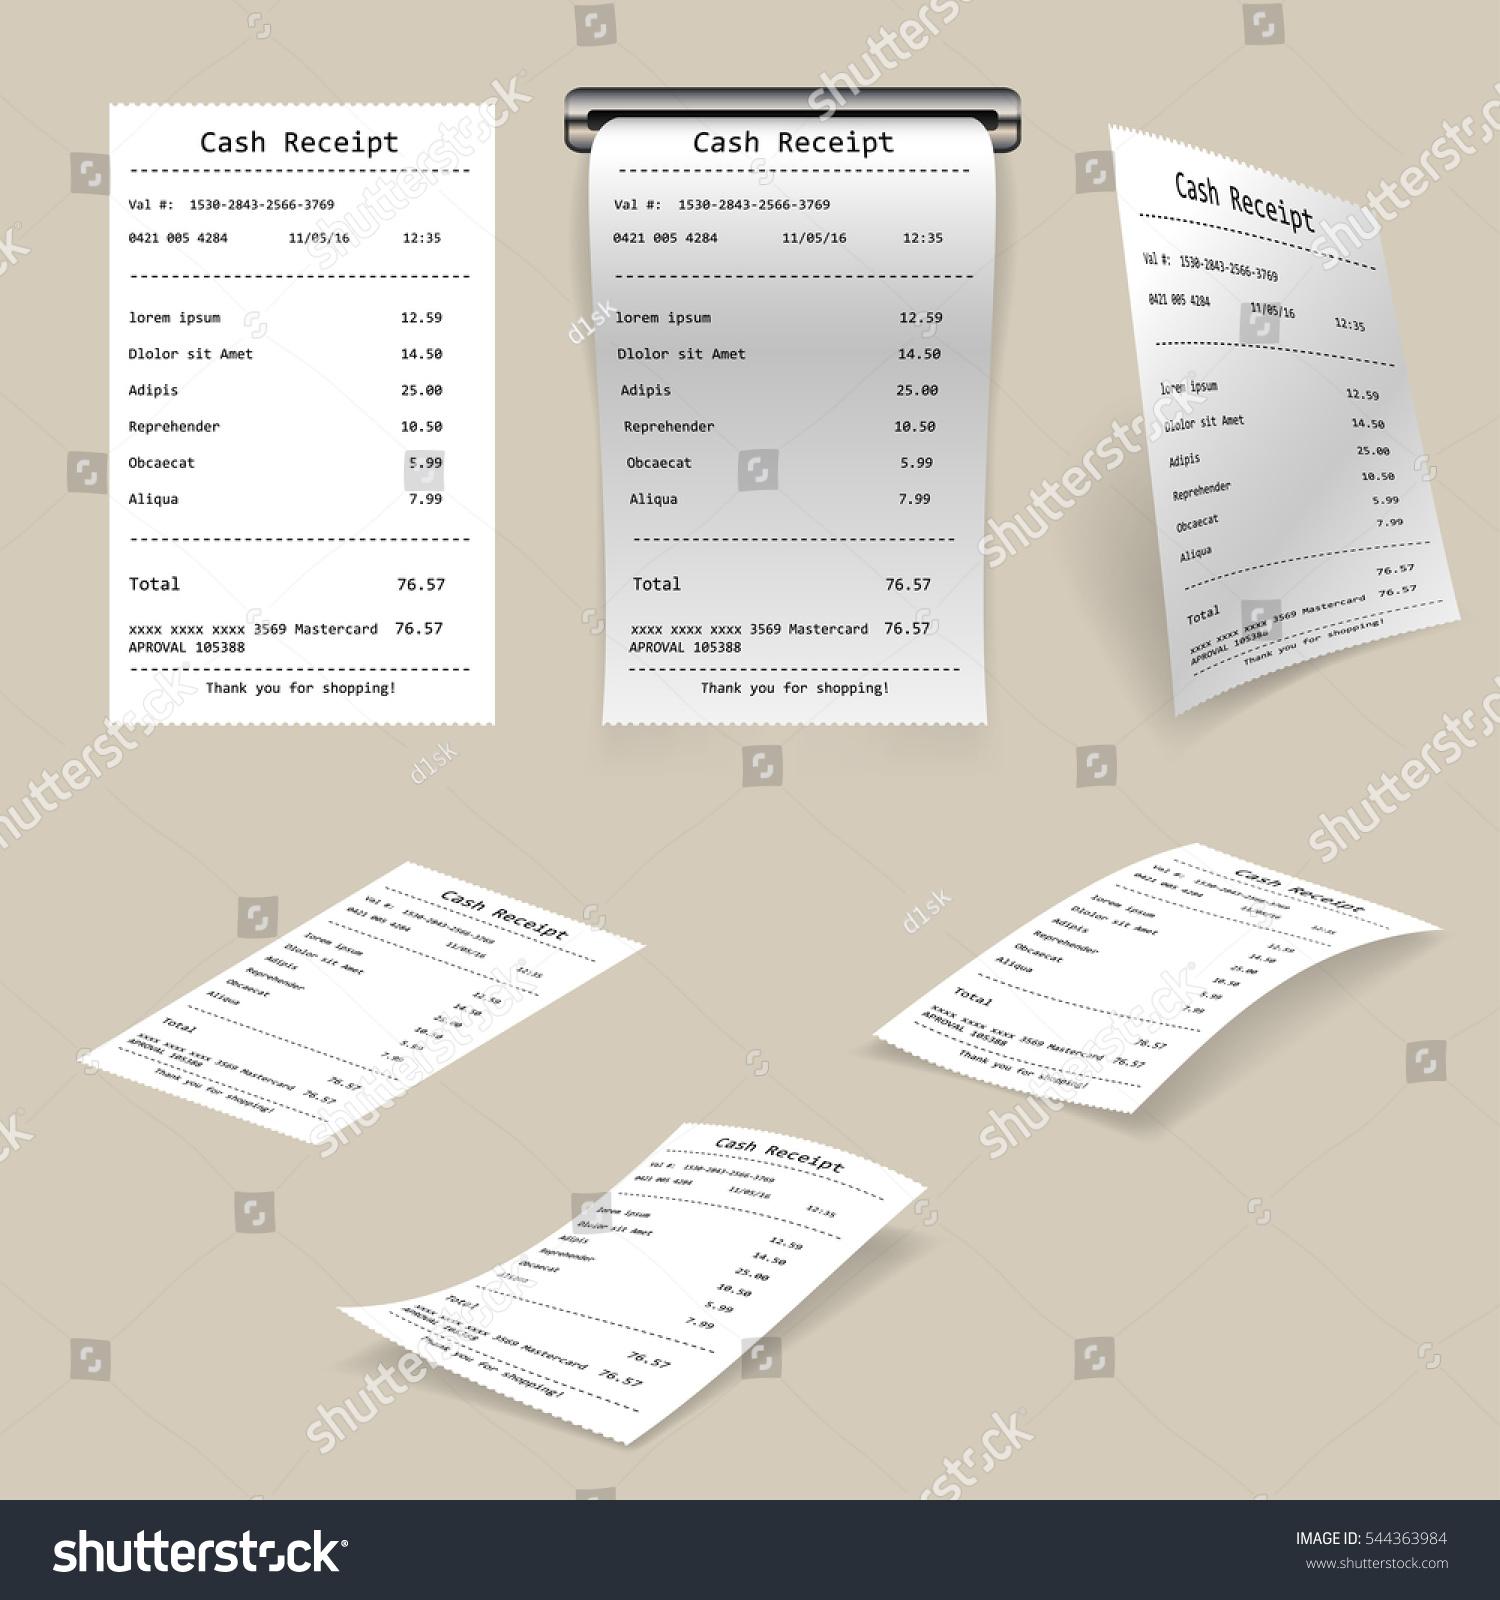 Cash Receipt Stock-Vektorgrafik 544363984 – Shutterstock